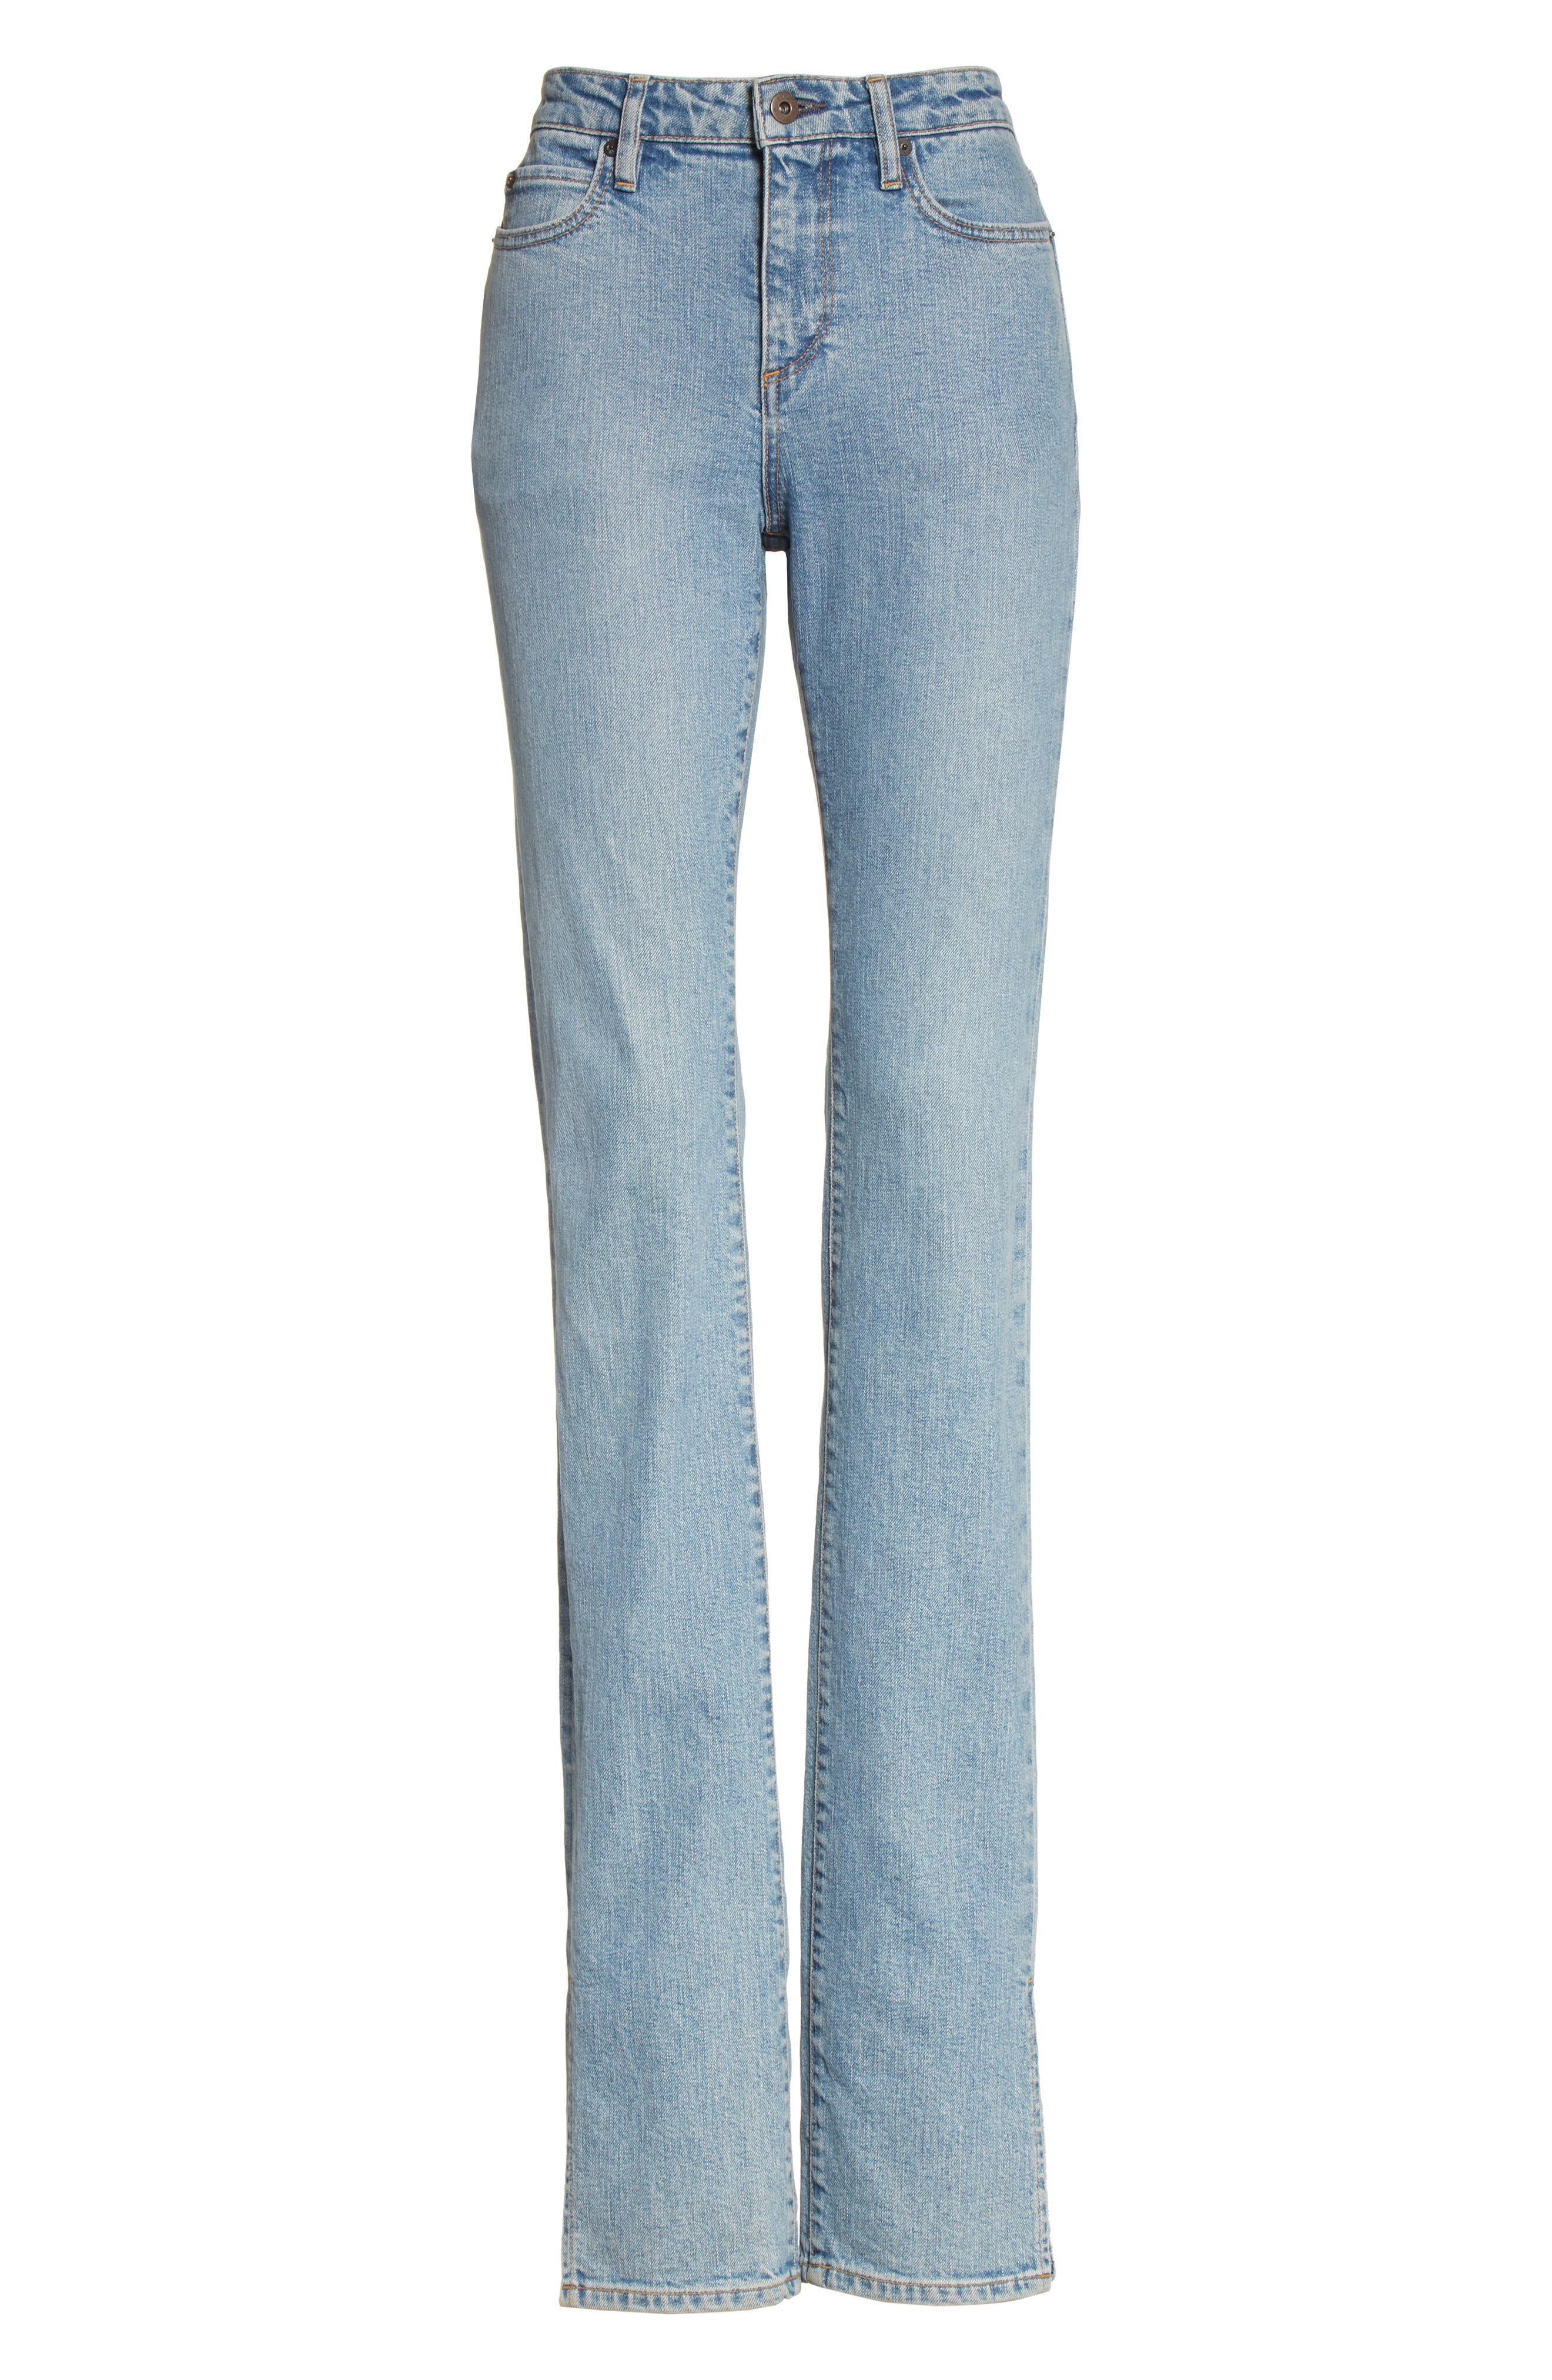 Lowry Split Hem Jeans,                             Alternate thumbnail 4, color,                             Mid Indigo Wash